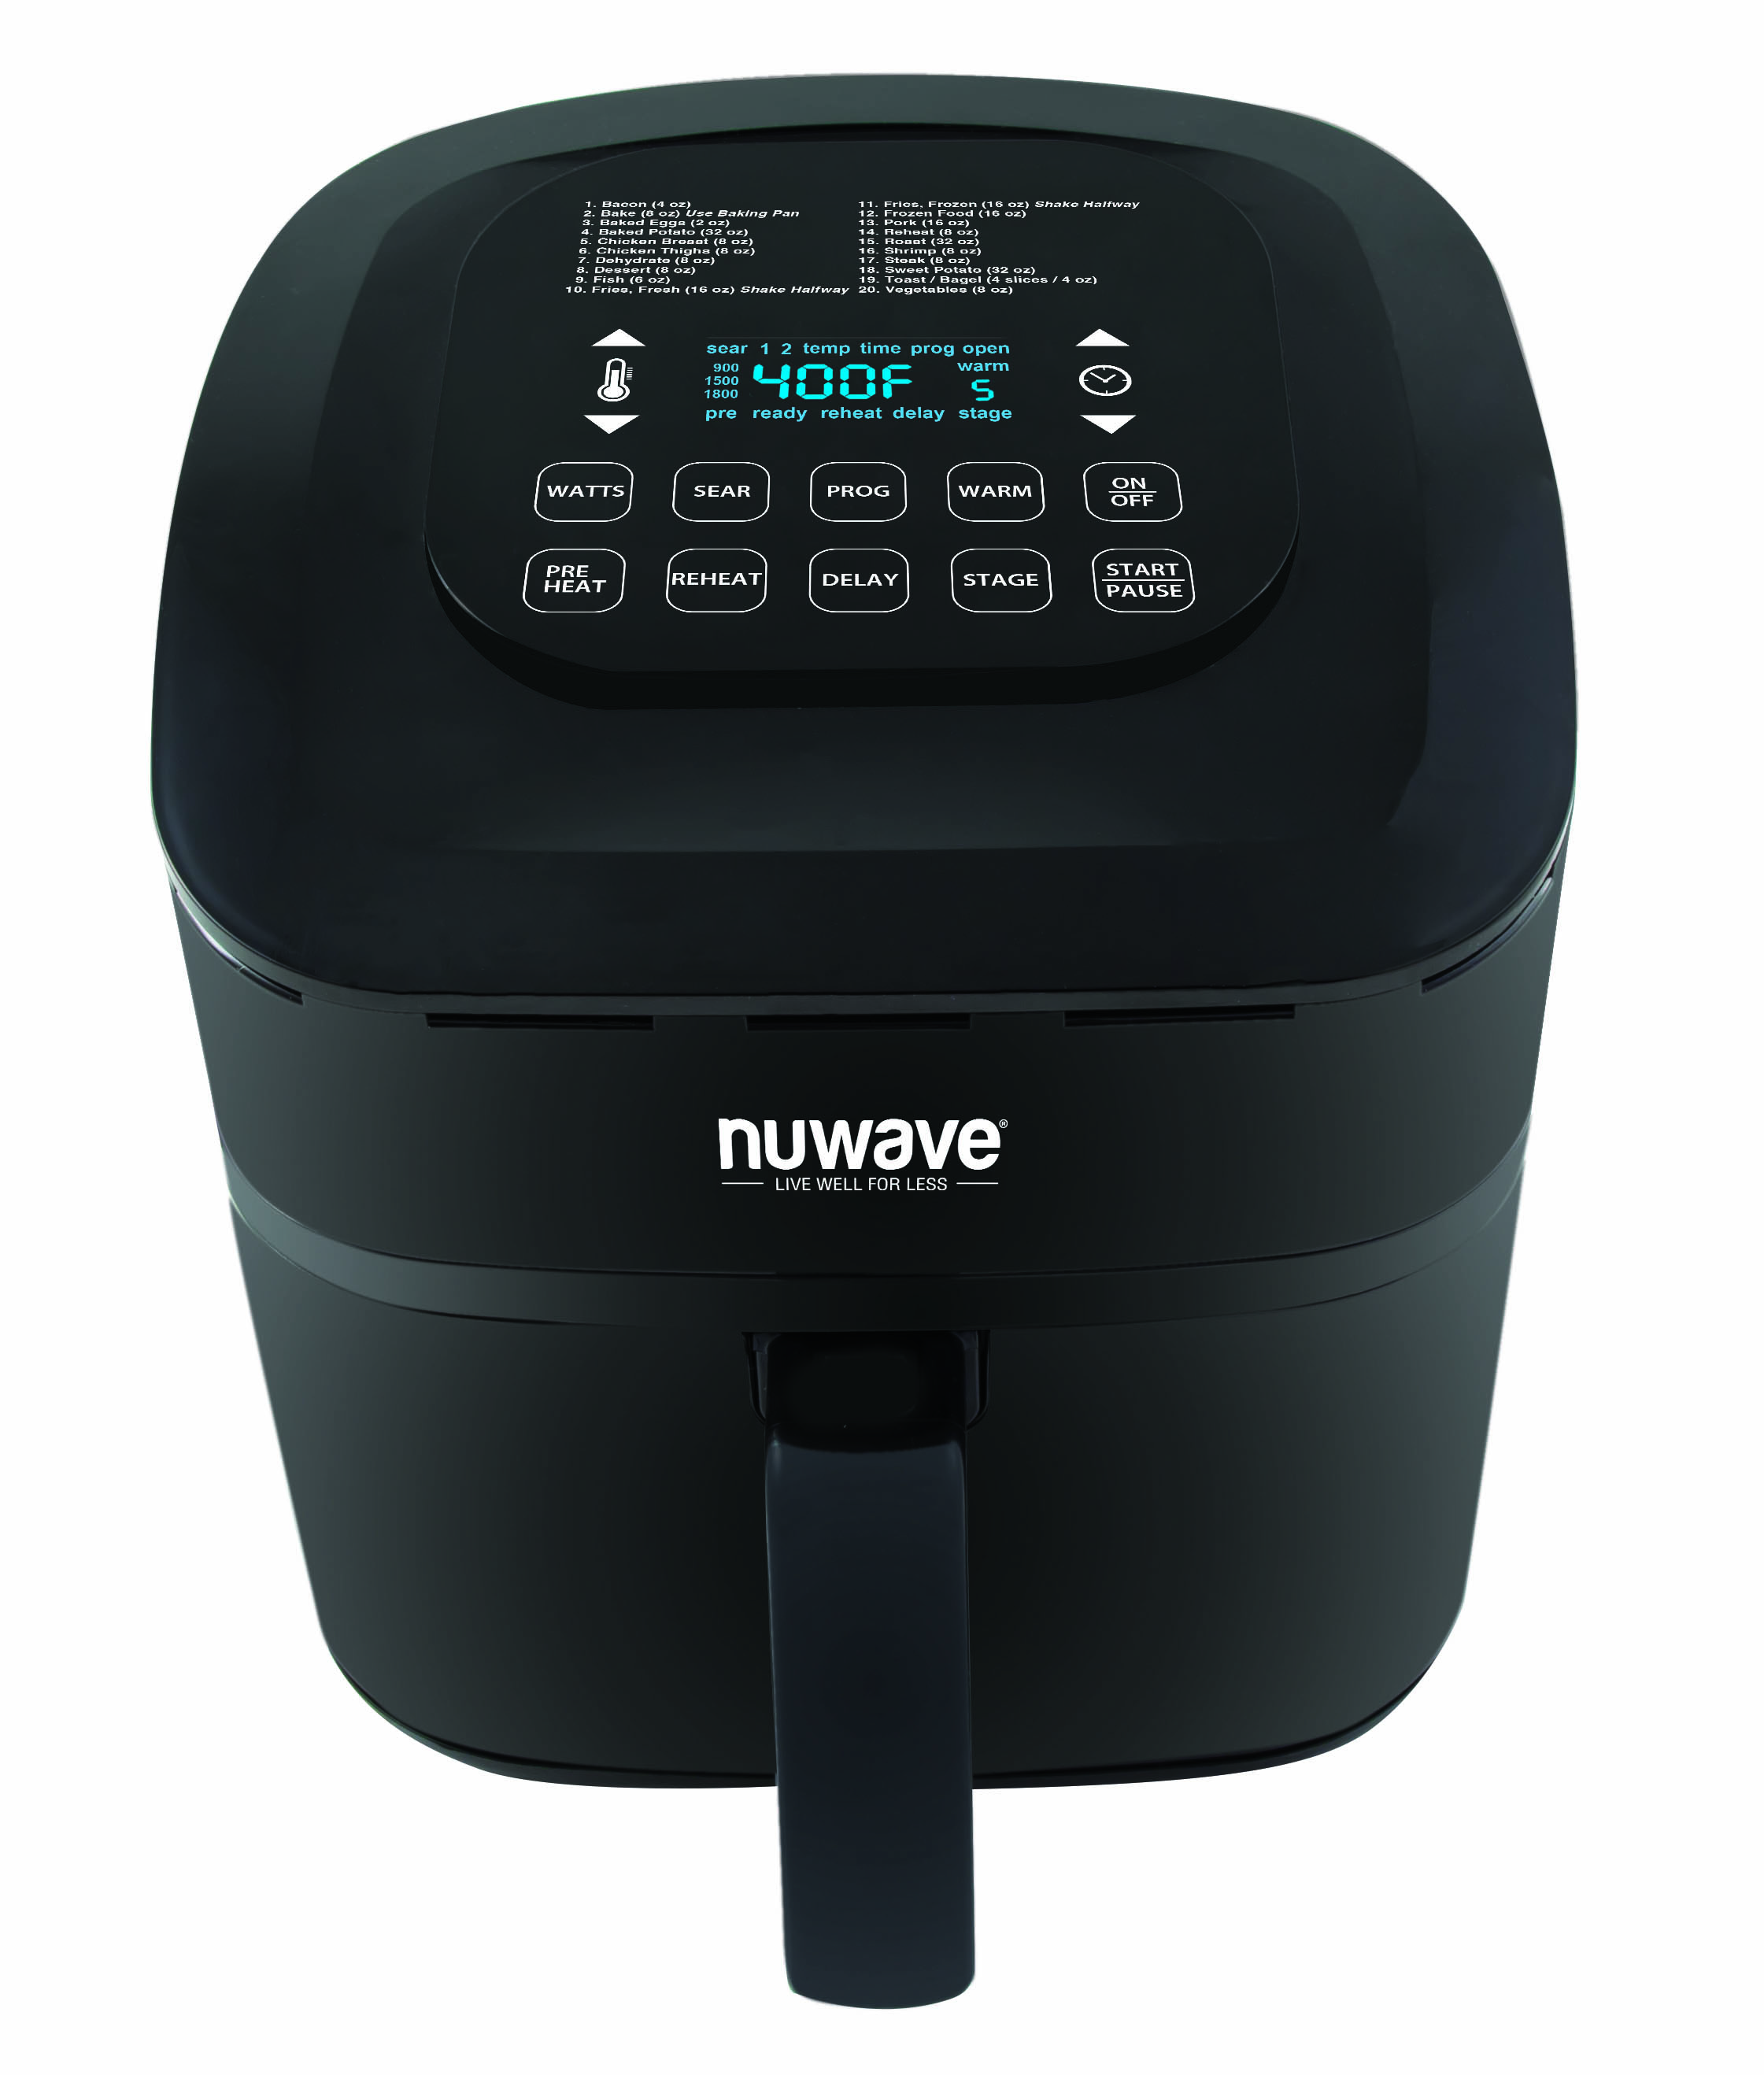 Nuwave 36102